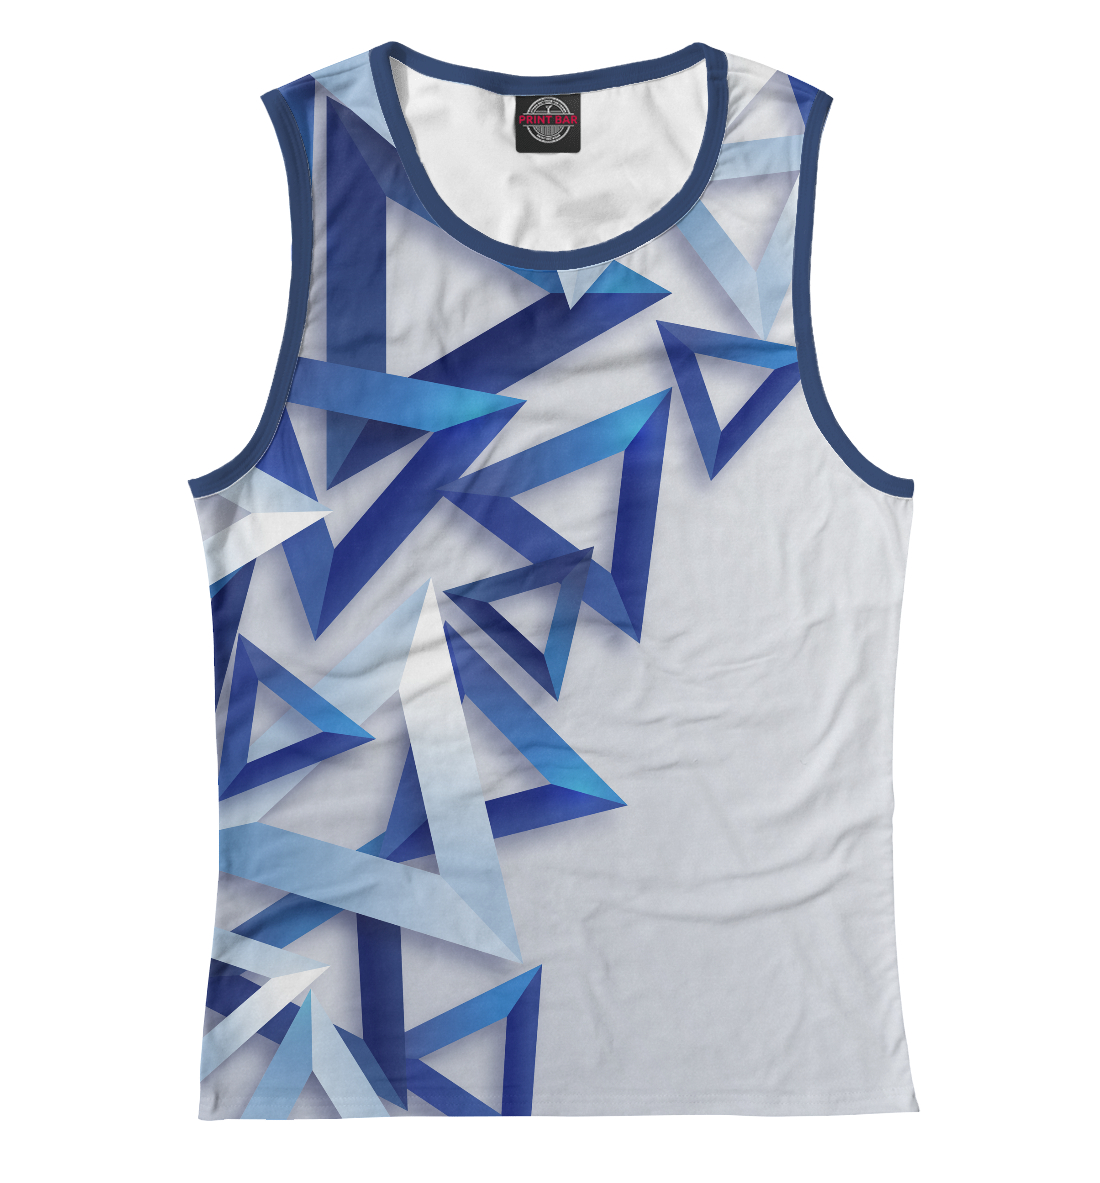 Купить Треугольники 3D, Printbar, Майки, APD-328002-may-1